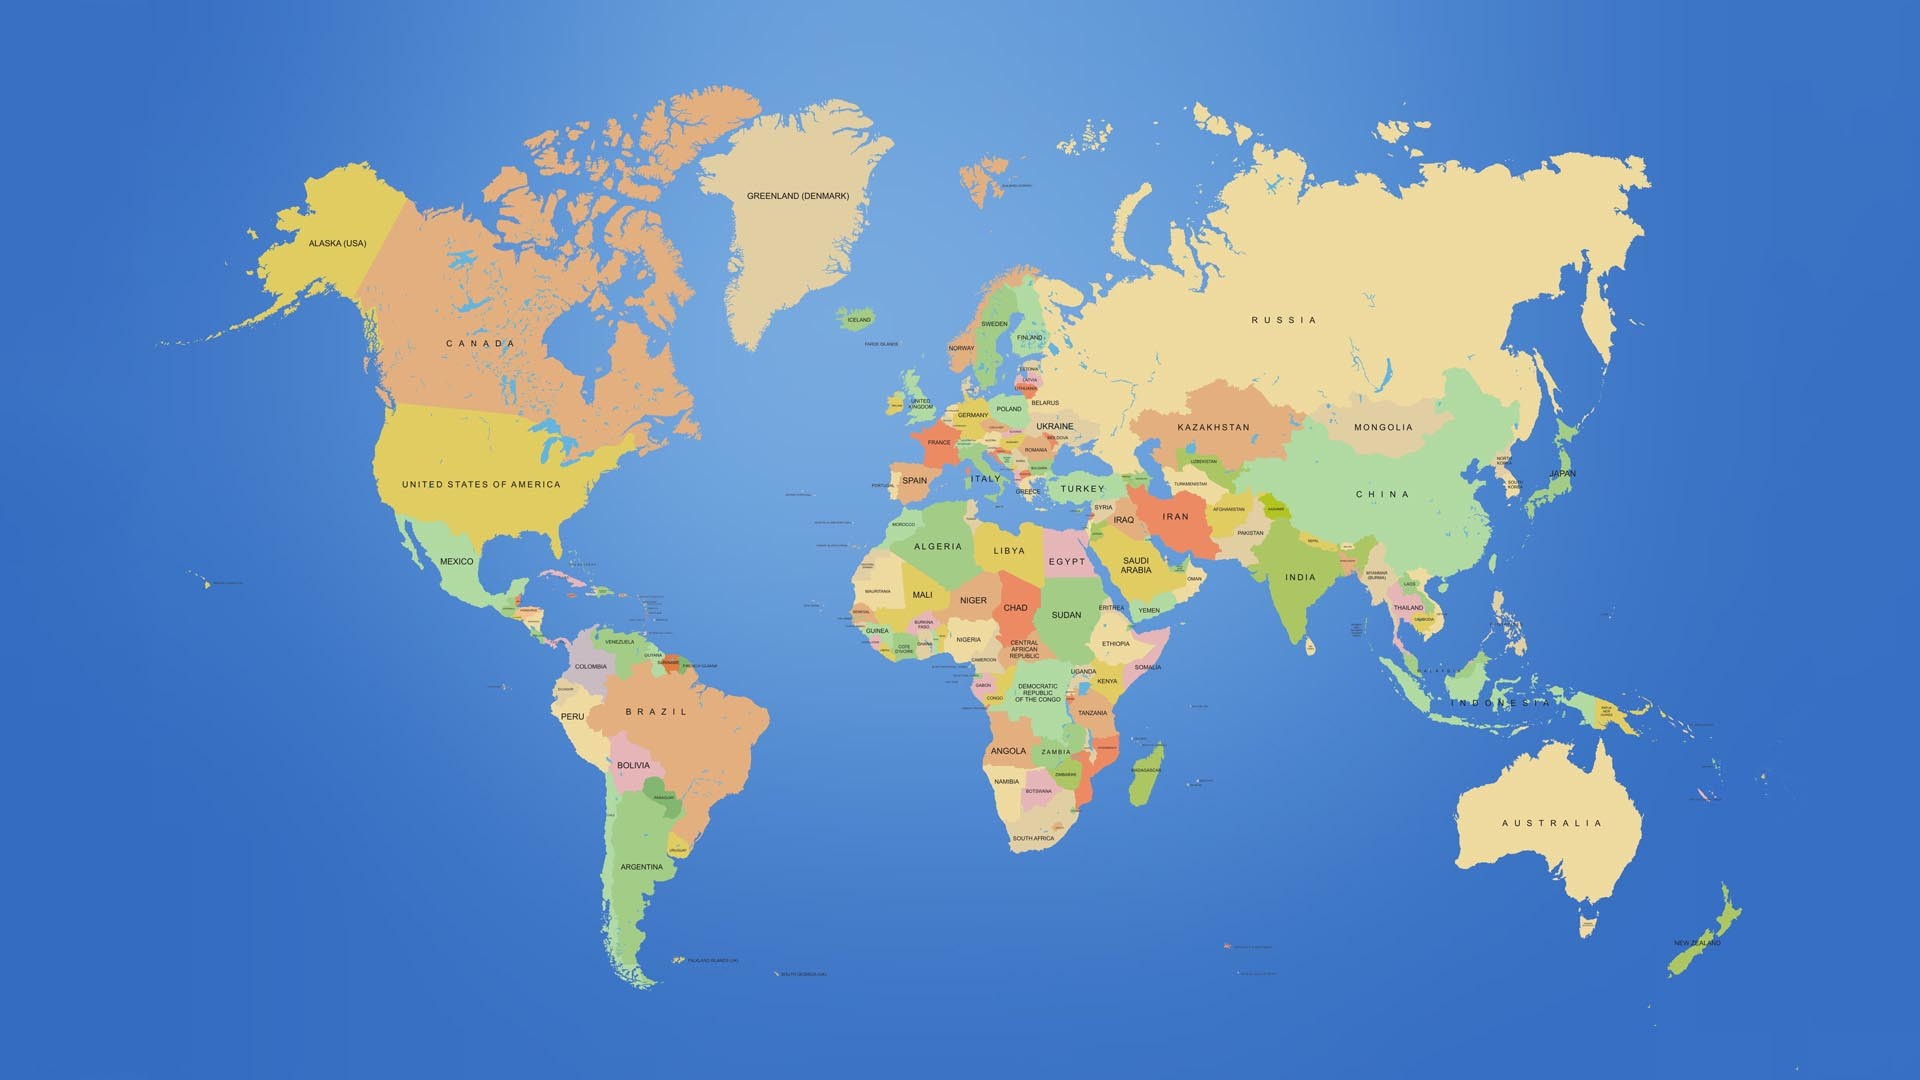 World map desktop wallpaper hd 70 images 1920x1080 world map wallpaper 6258 gumiabroncs Images